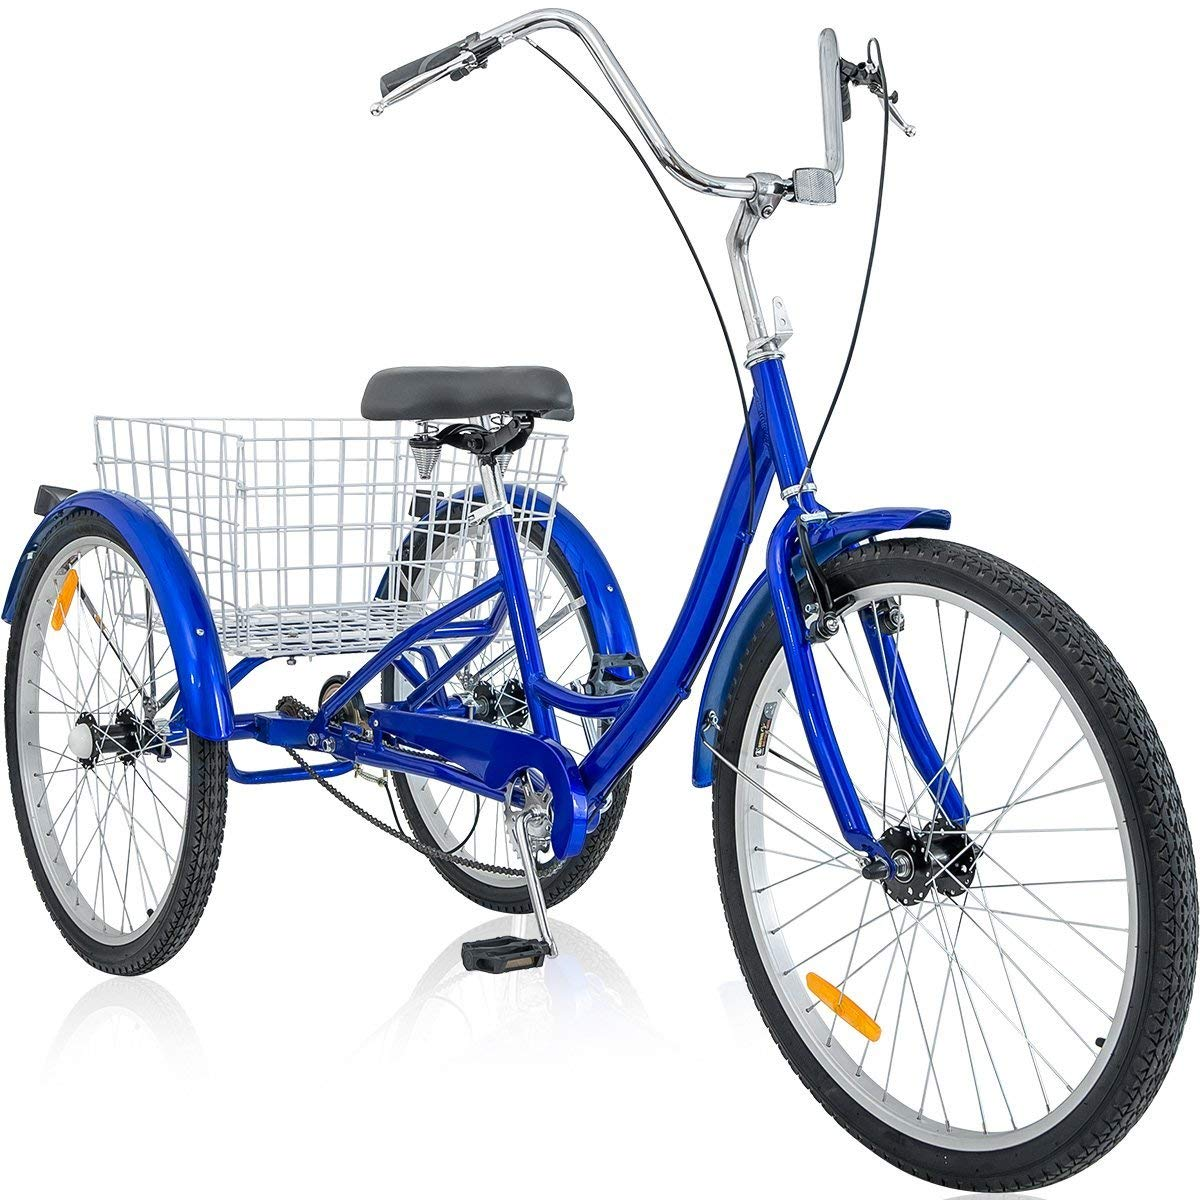 Cheap Adult 3 Wheel Trike, find Adult 3 Wheel Trike deals on